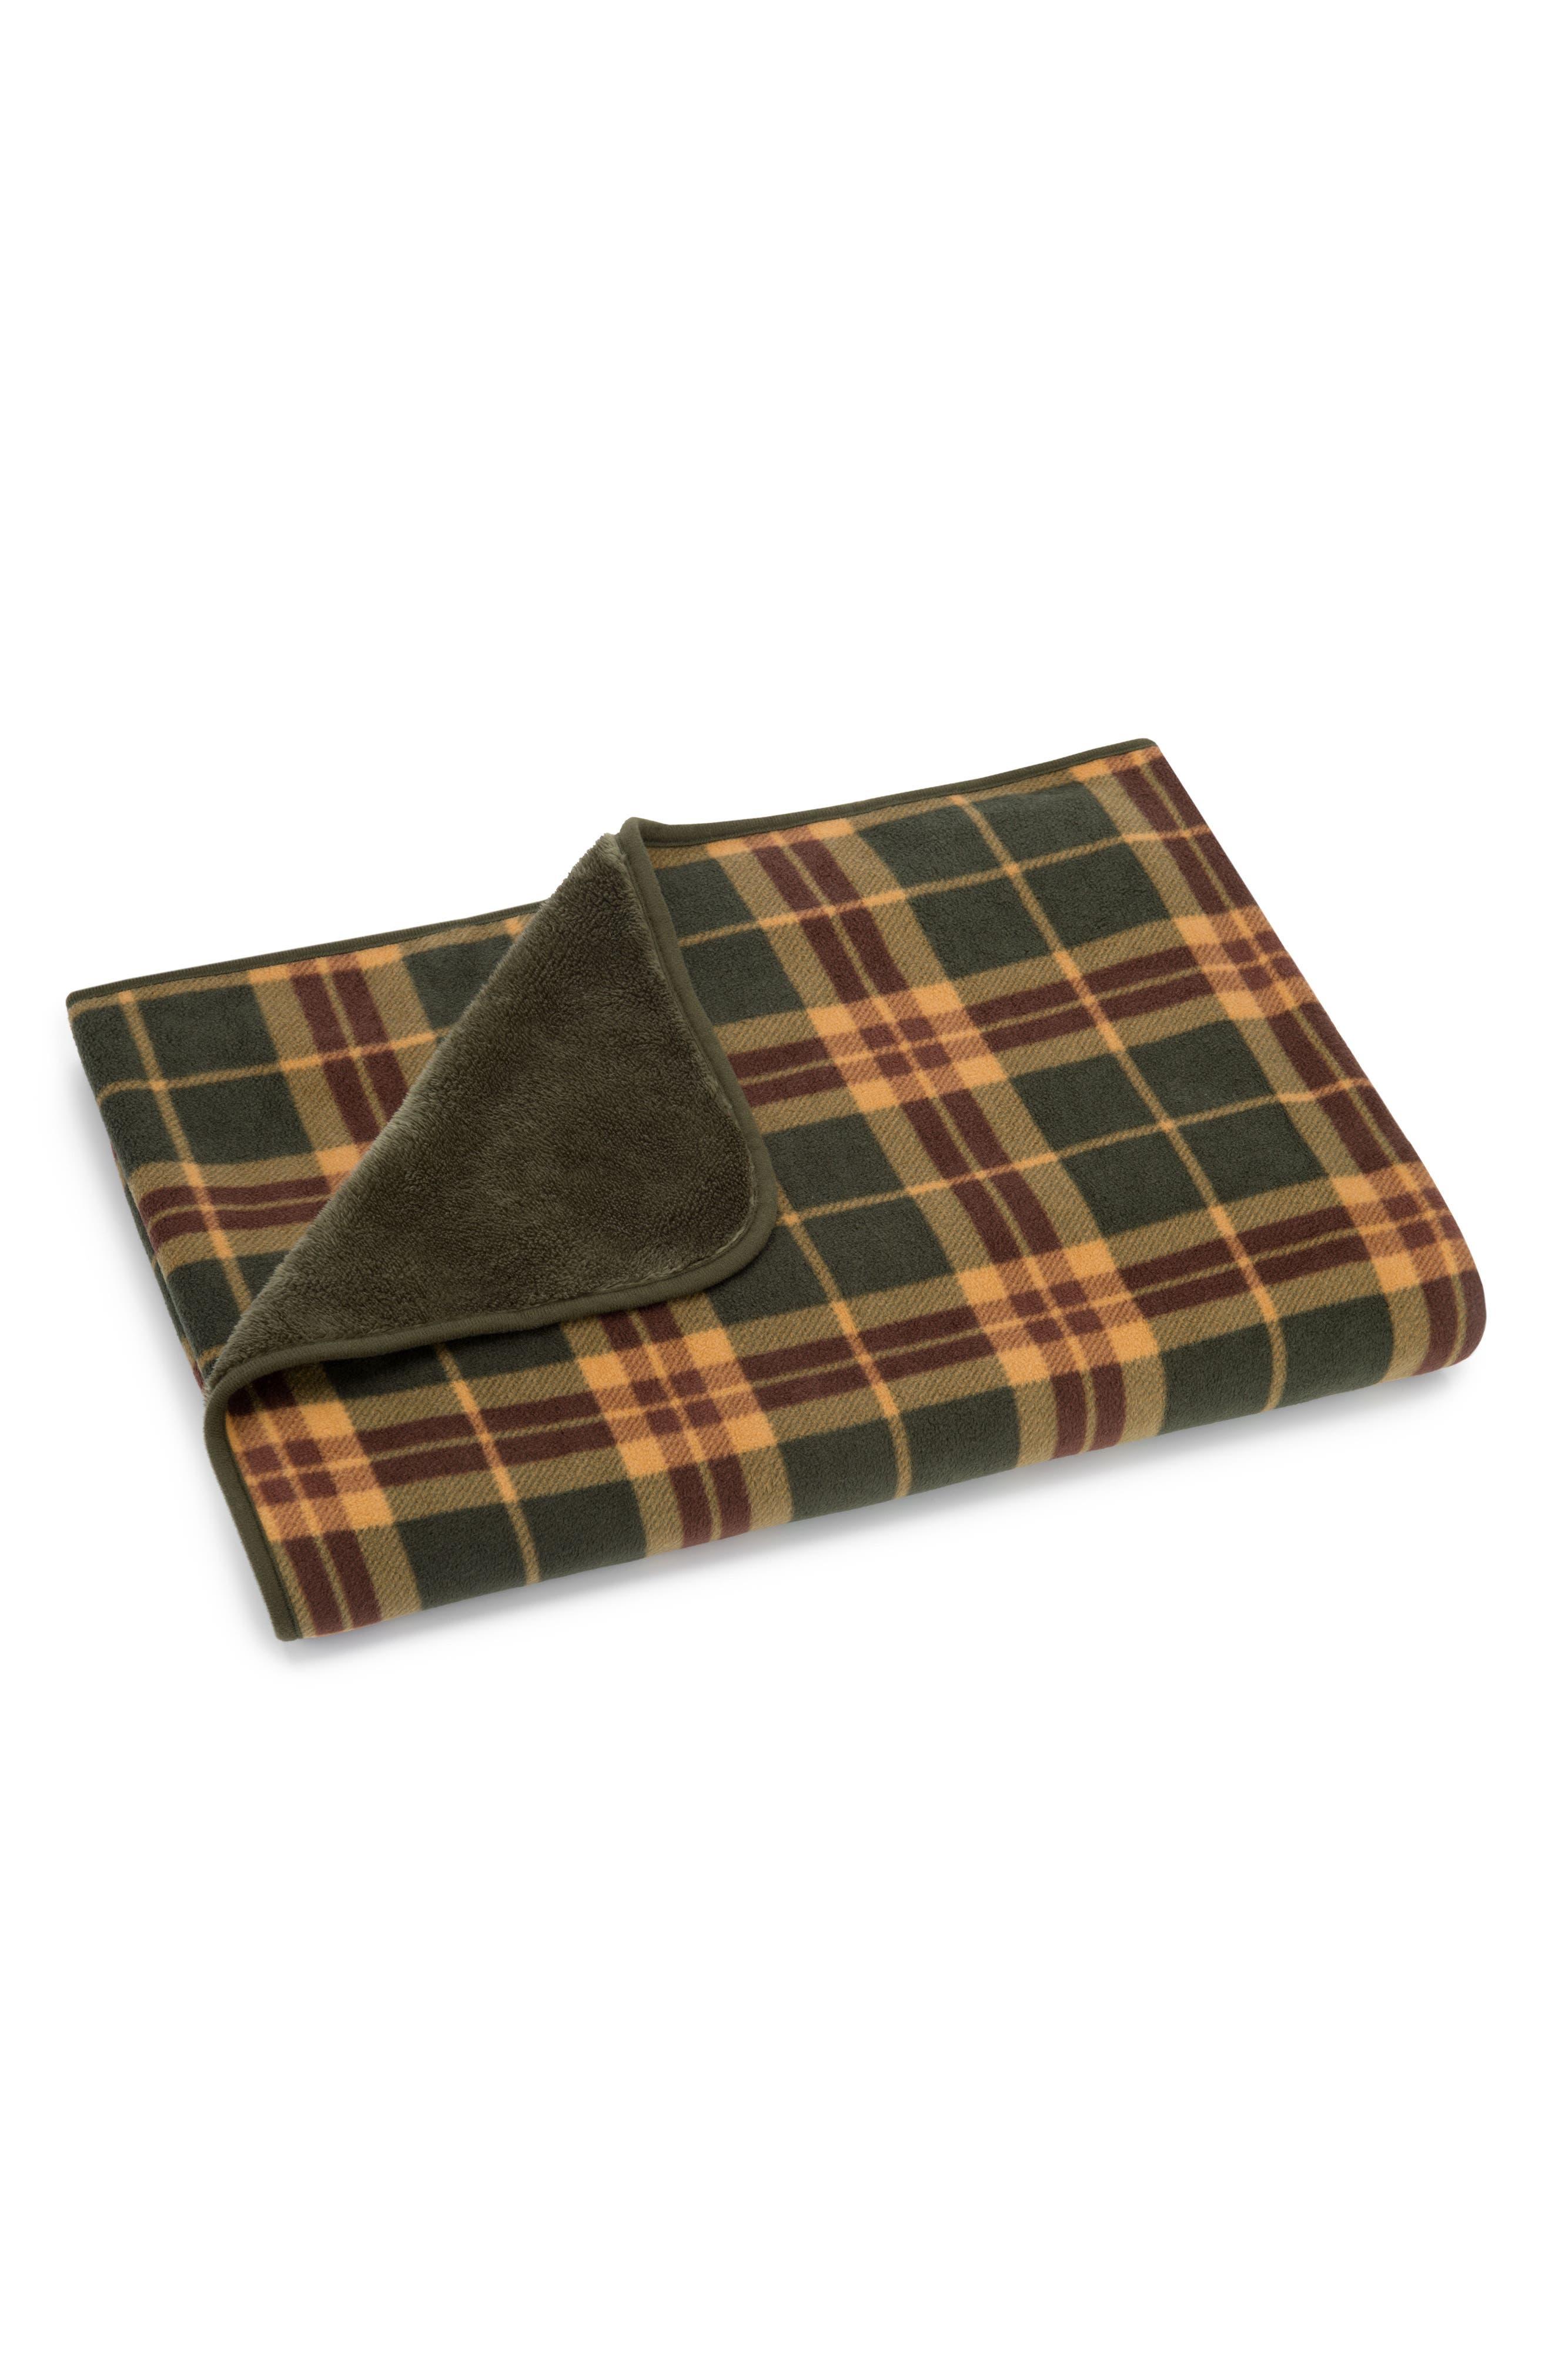 Ambler Plaid Fleece Throw,                         Main,                         color,